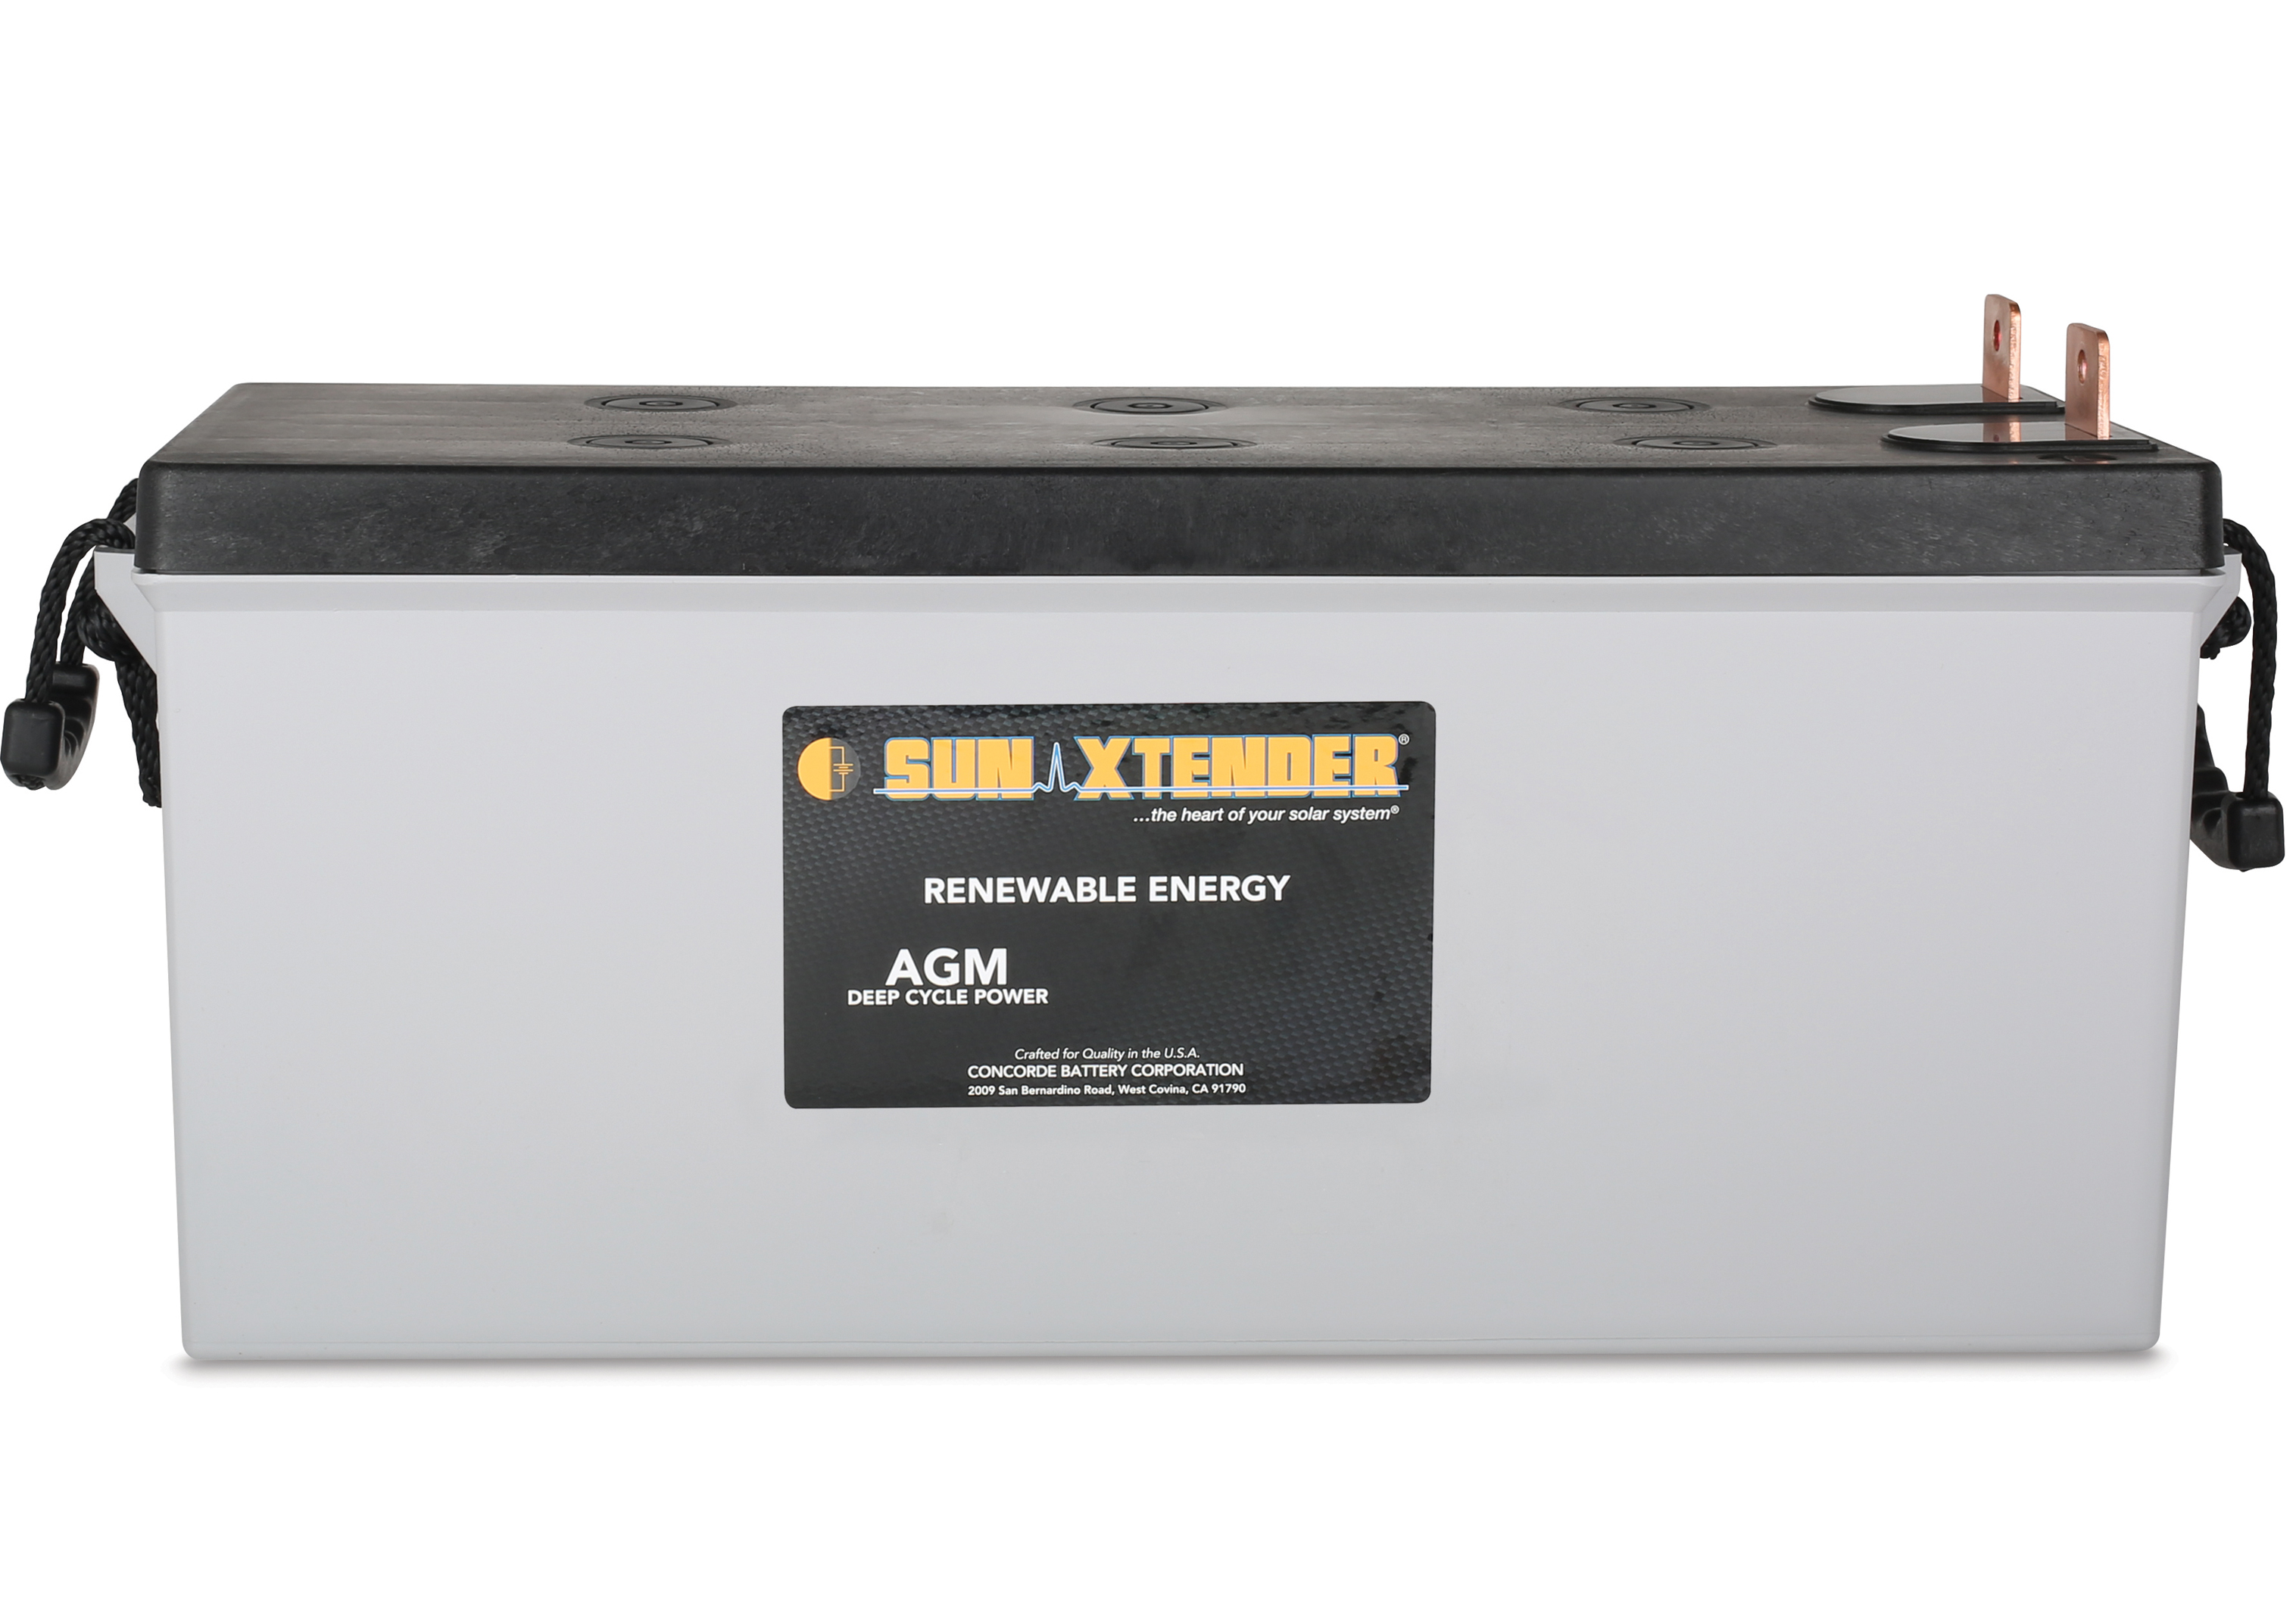 sun solar system batteries - photo #2